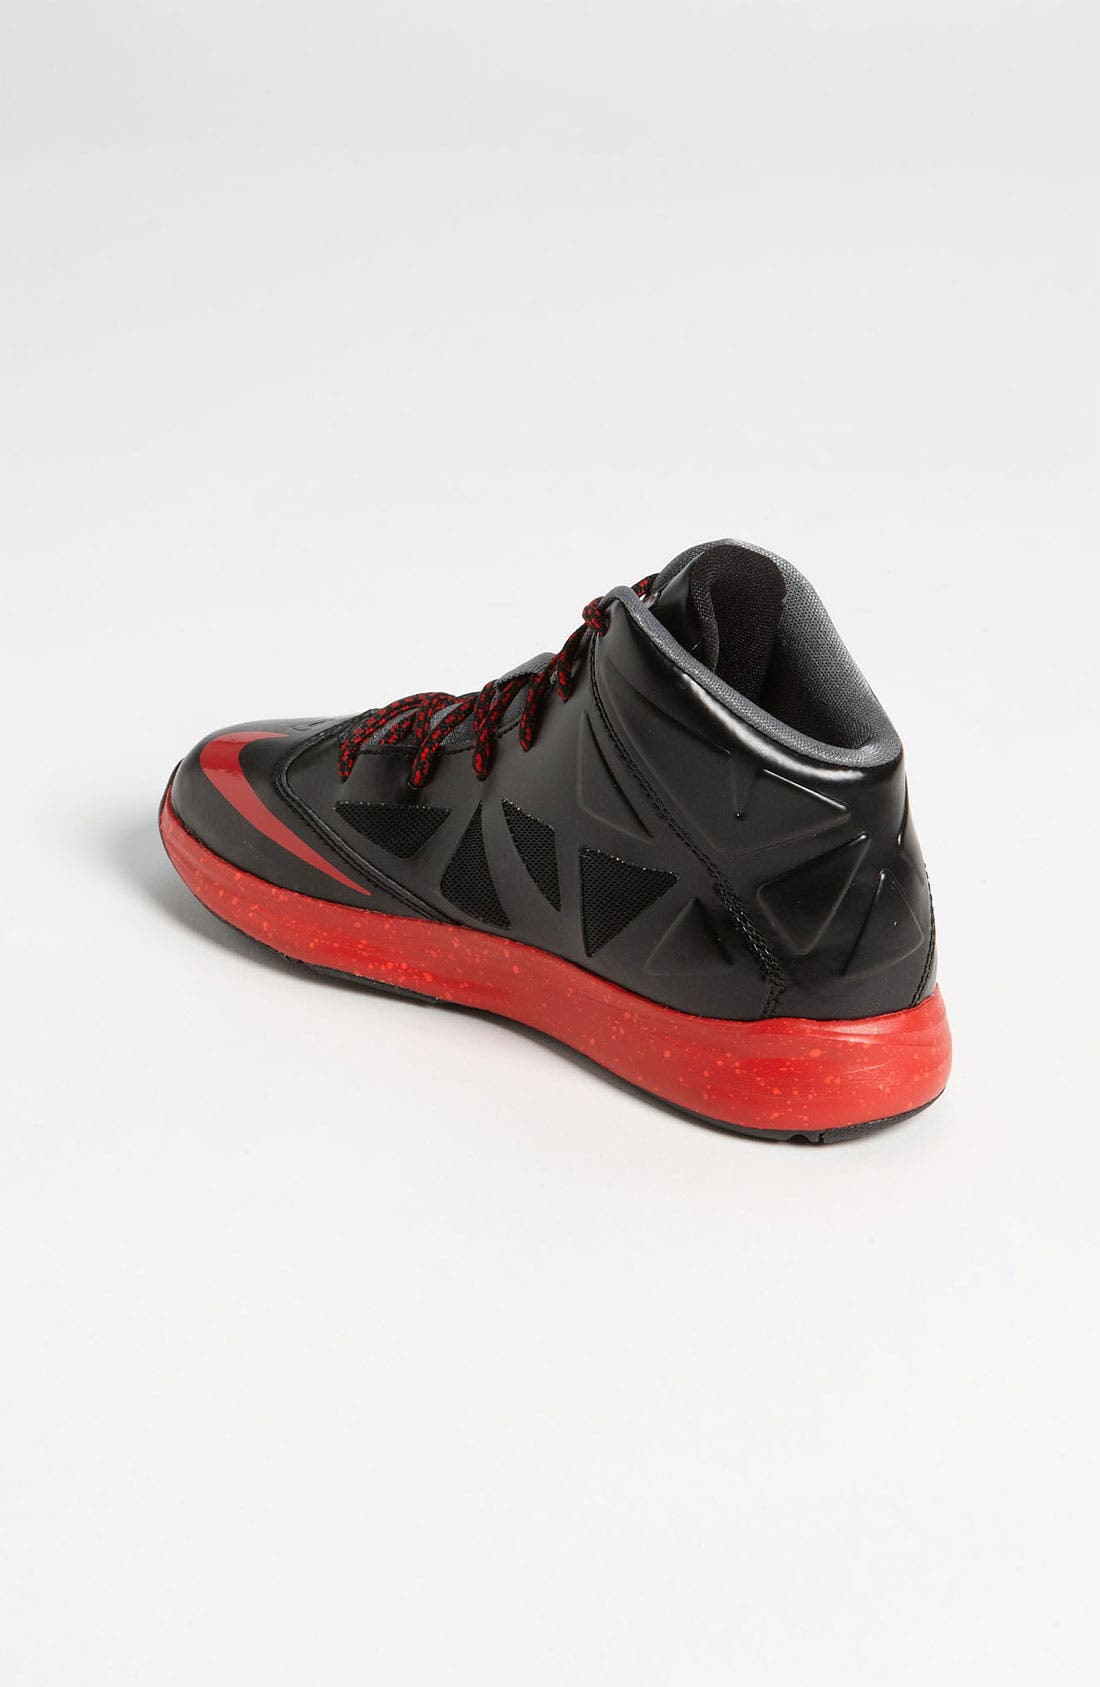 Alternate Image 2  - Nike 'LeBron 10 Pressure' Basketball Shoe (Toddler & Little Kid)